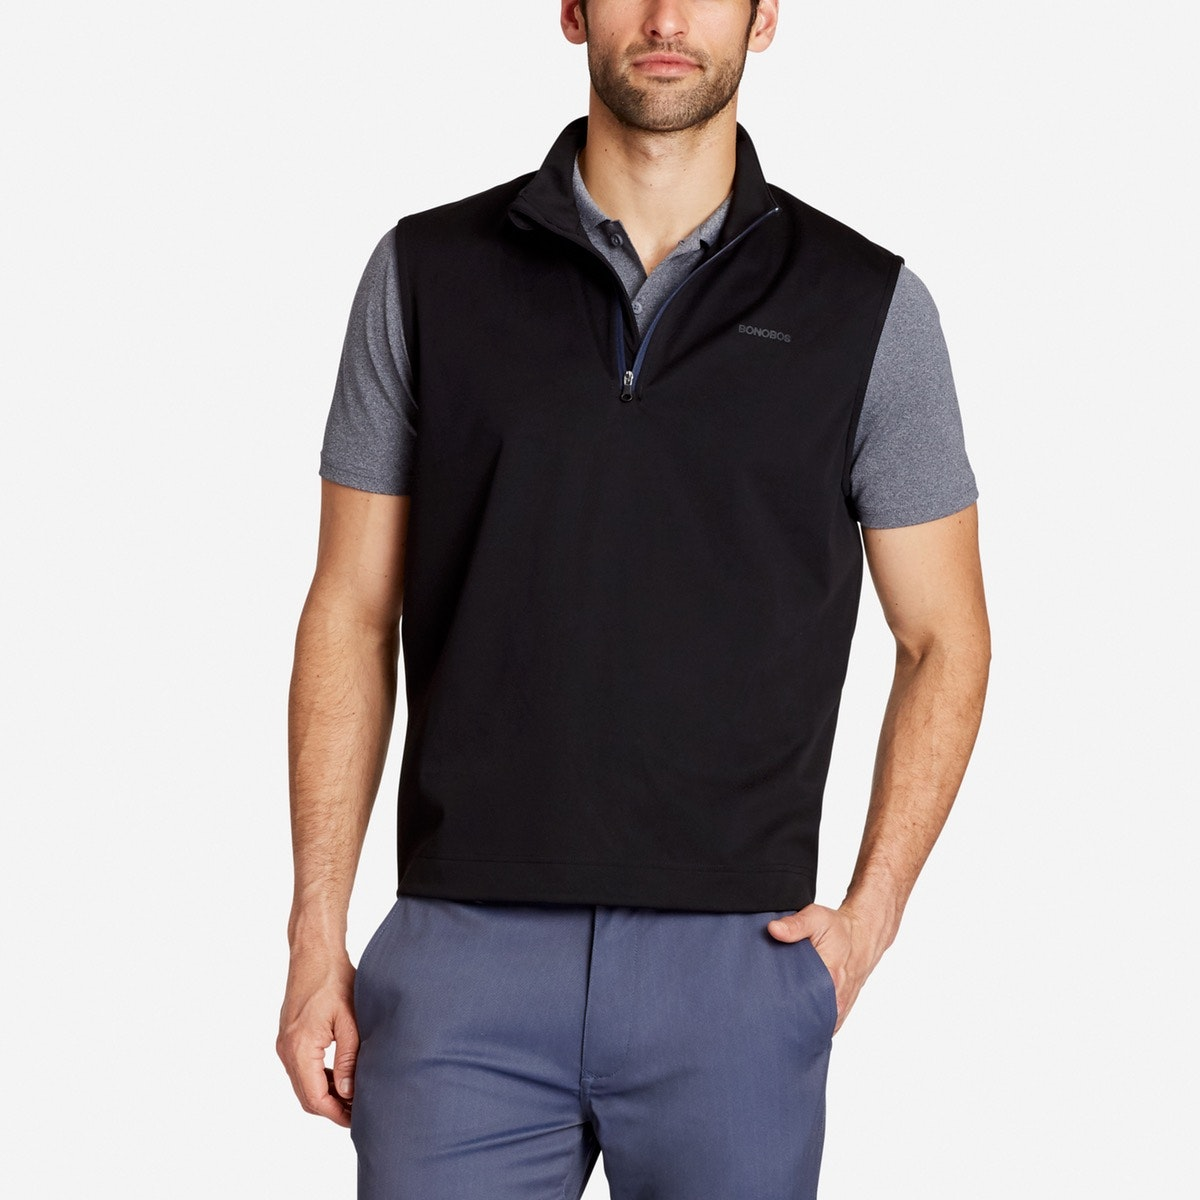 Knockdown Tech Golf Vest